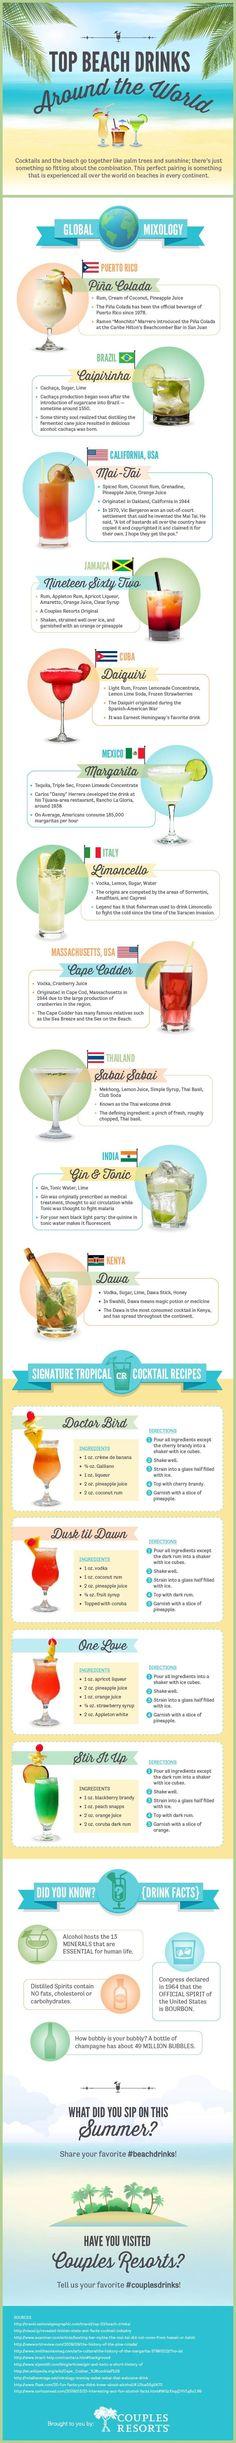 Top Beach Drinks Around The World